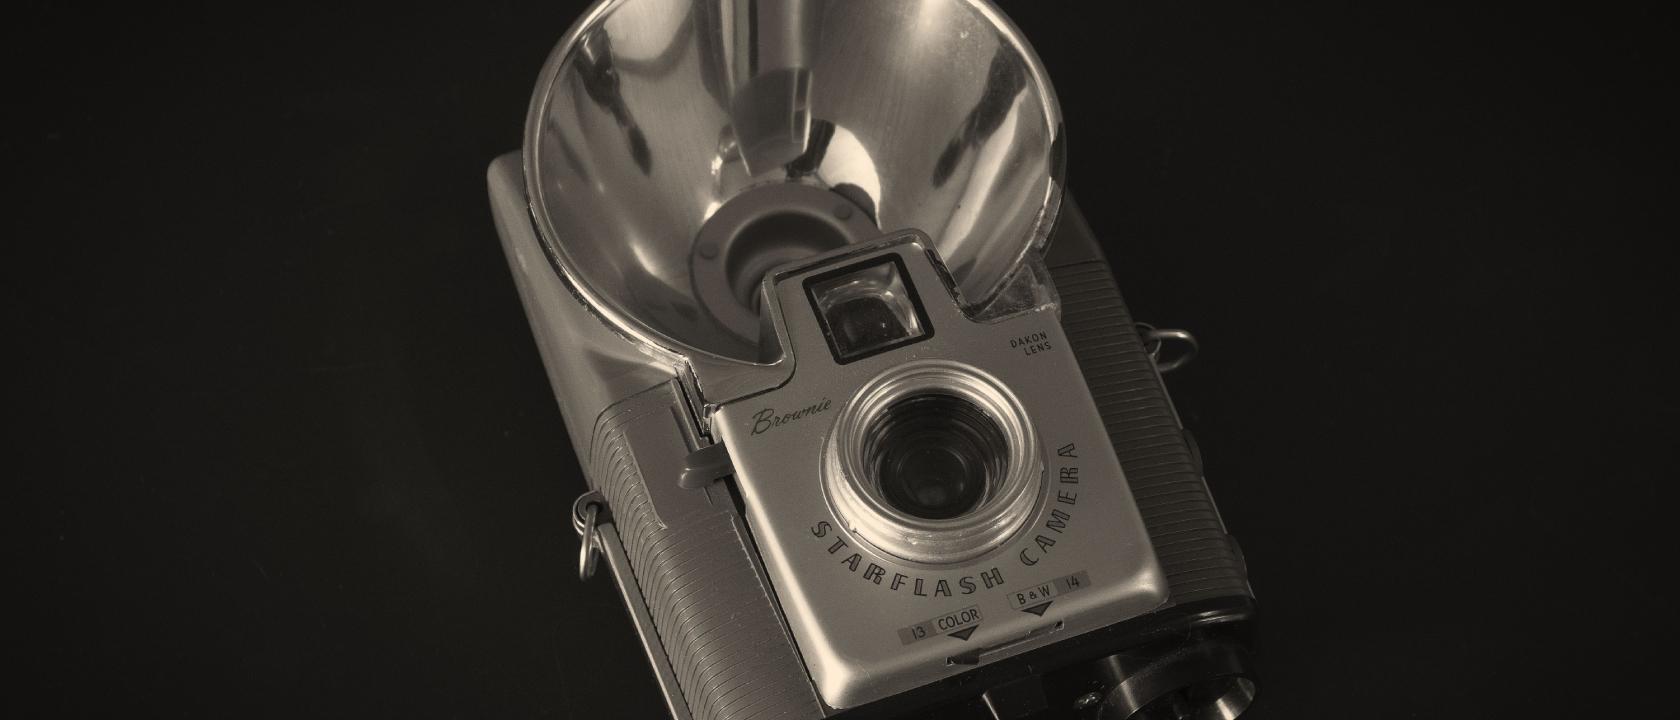 Permalink zu:Kodak, Brownie Starflash